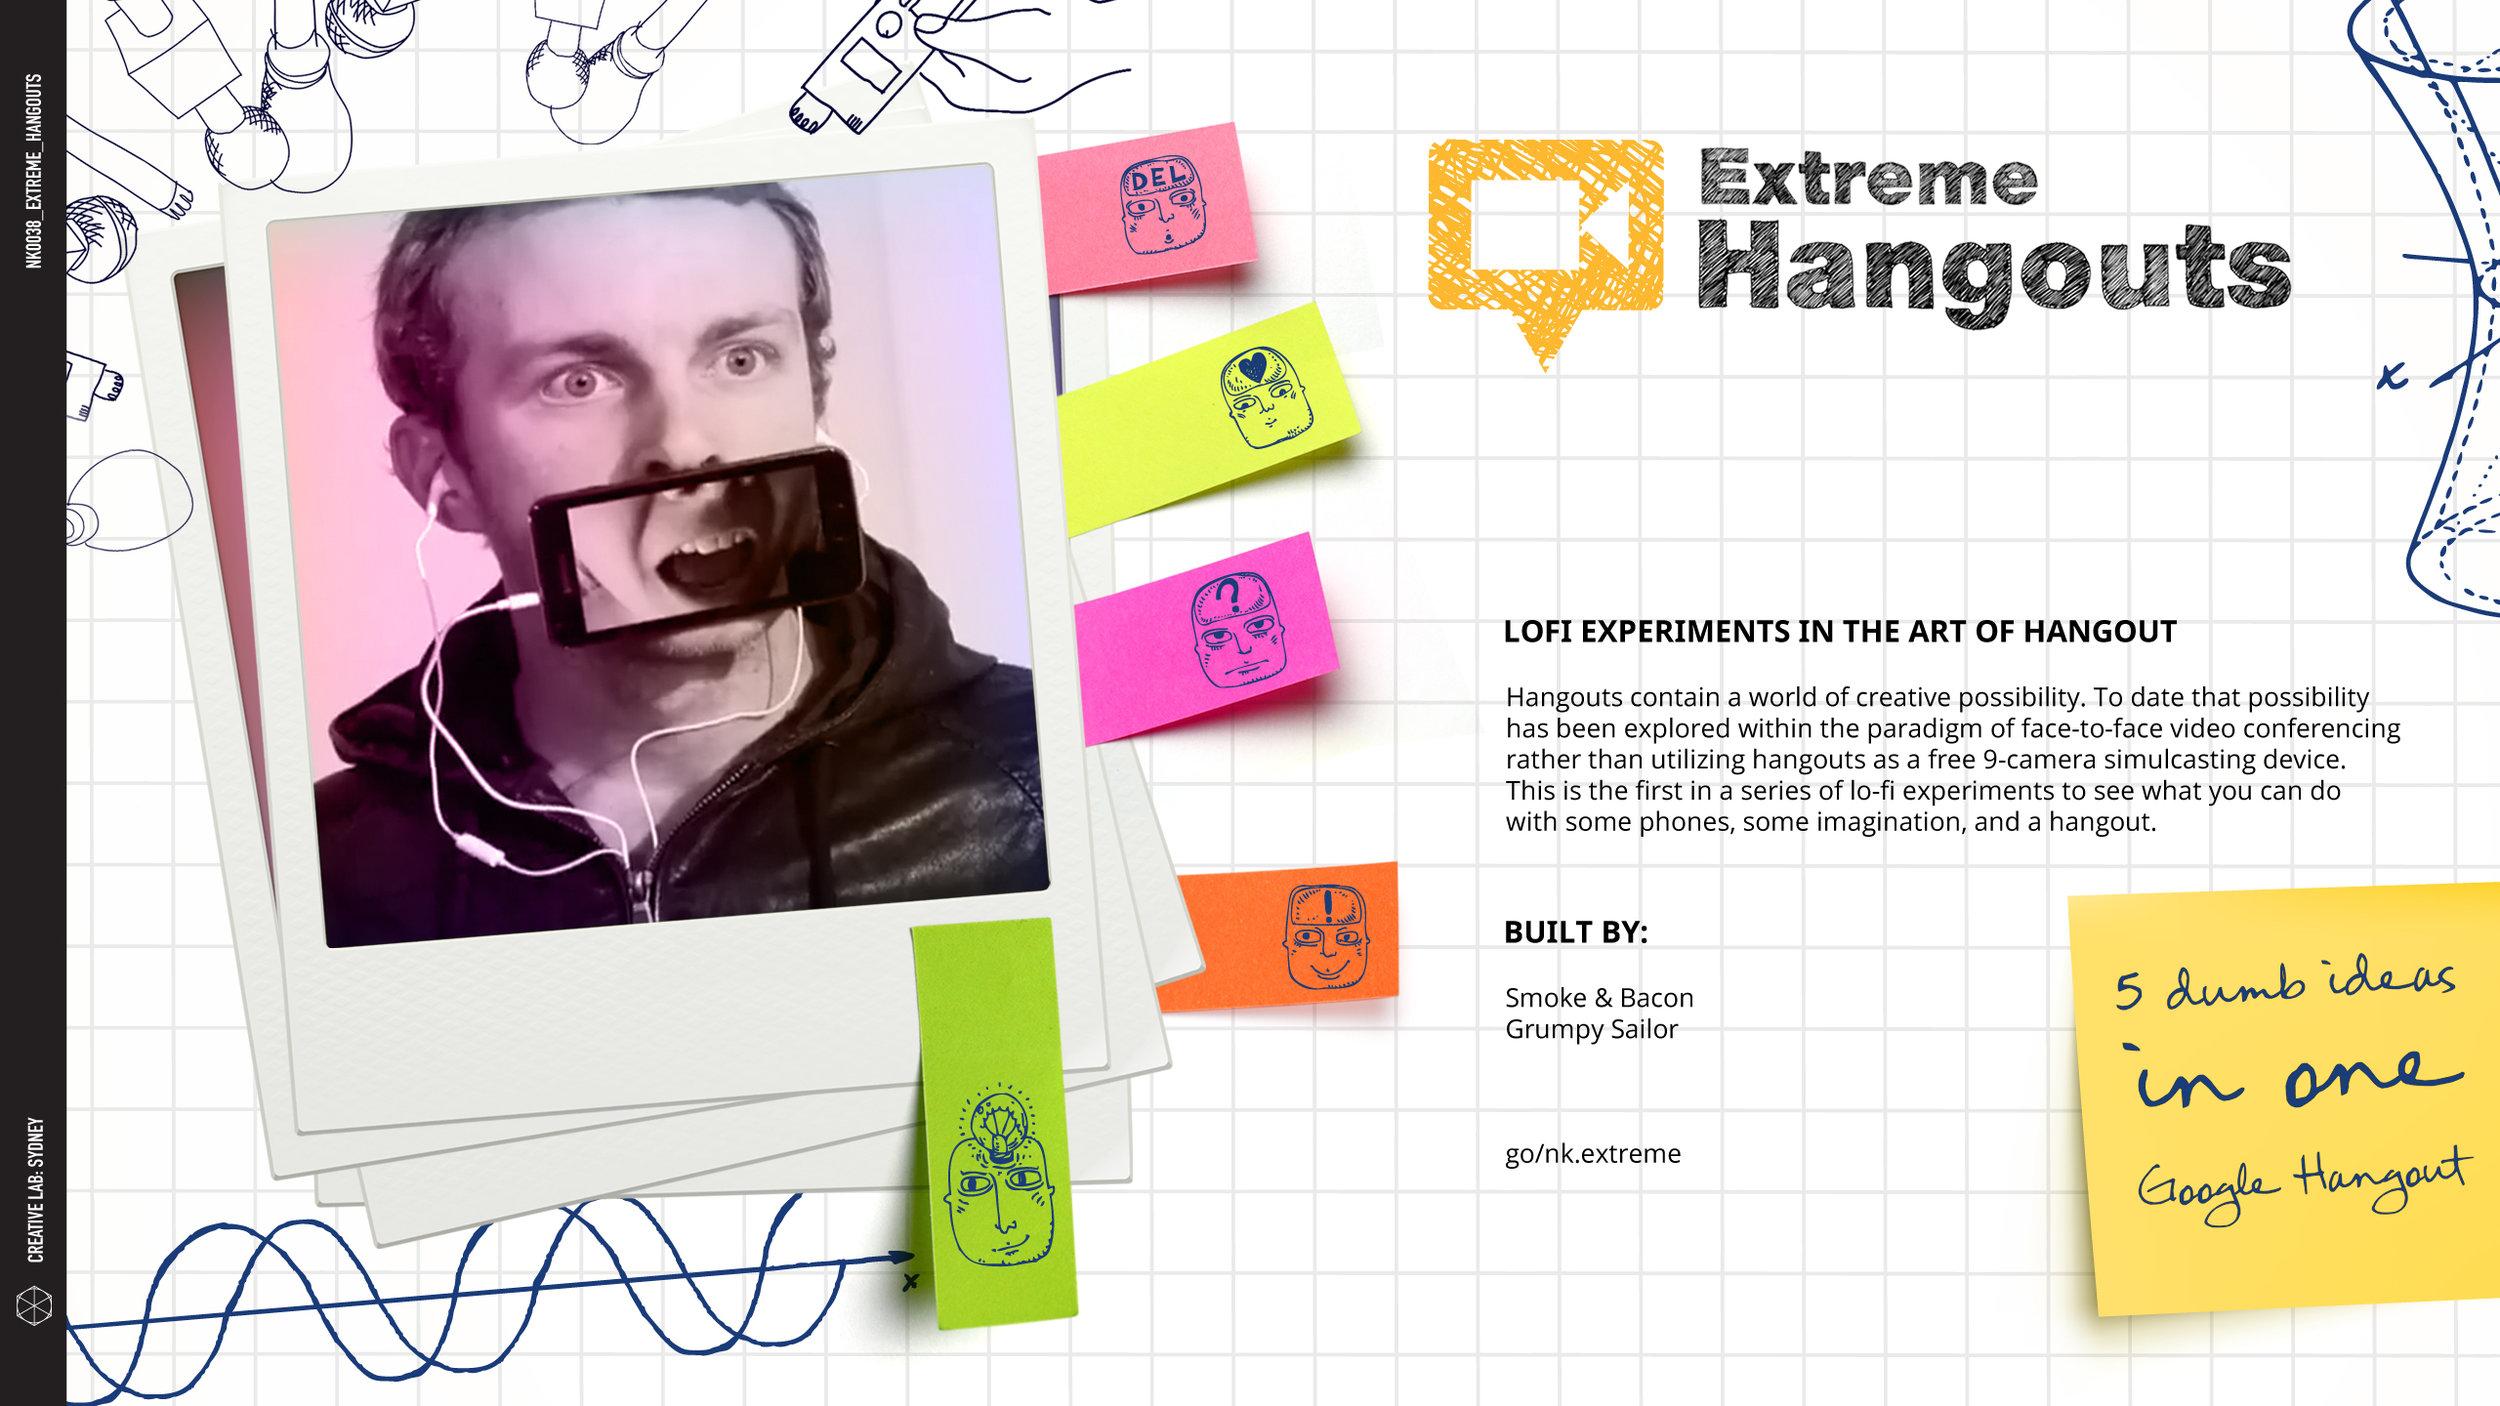 NK0038_Extreme_Hangouts_Screen01.jpg